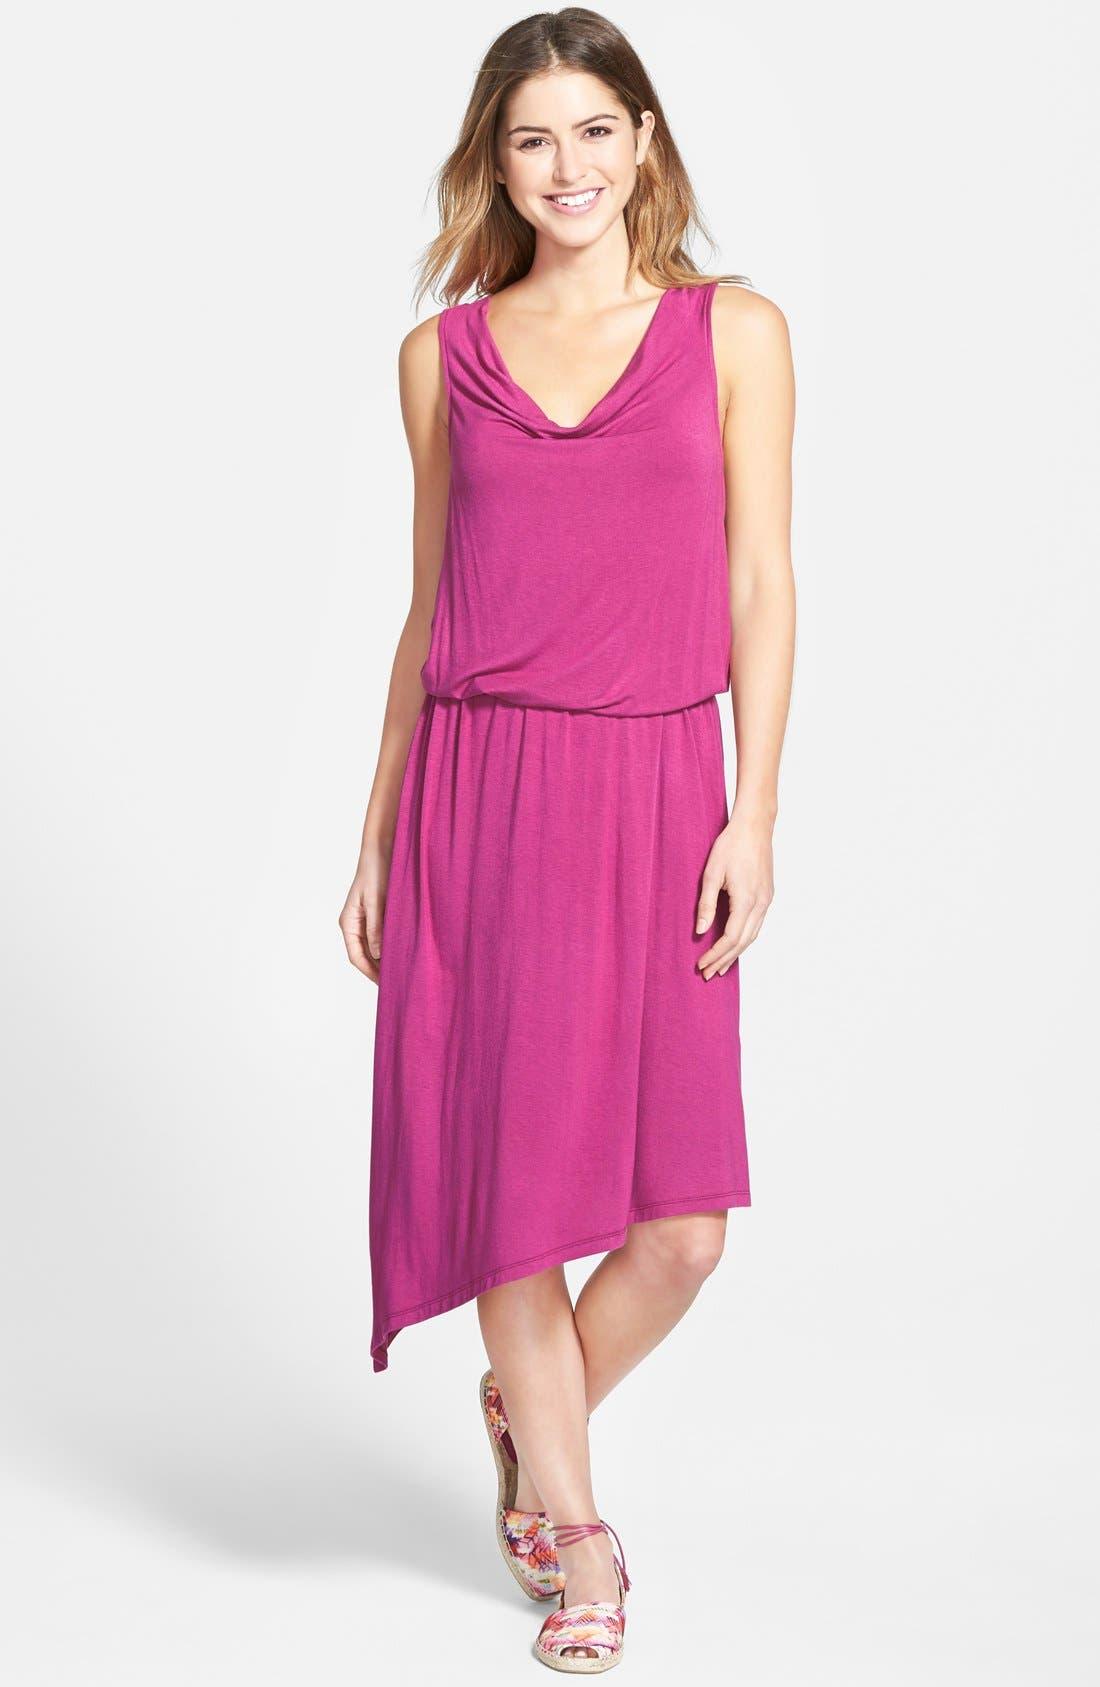 Main Image - Halogen® Blouson Dress with Asymmetrical Hem (Regular & Petite)